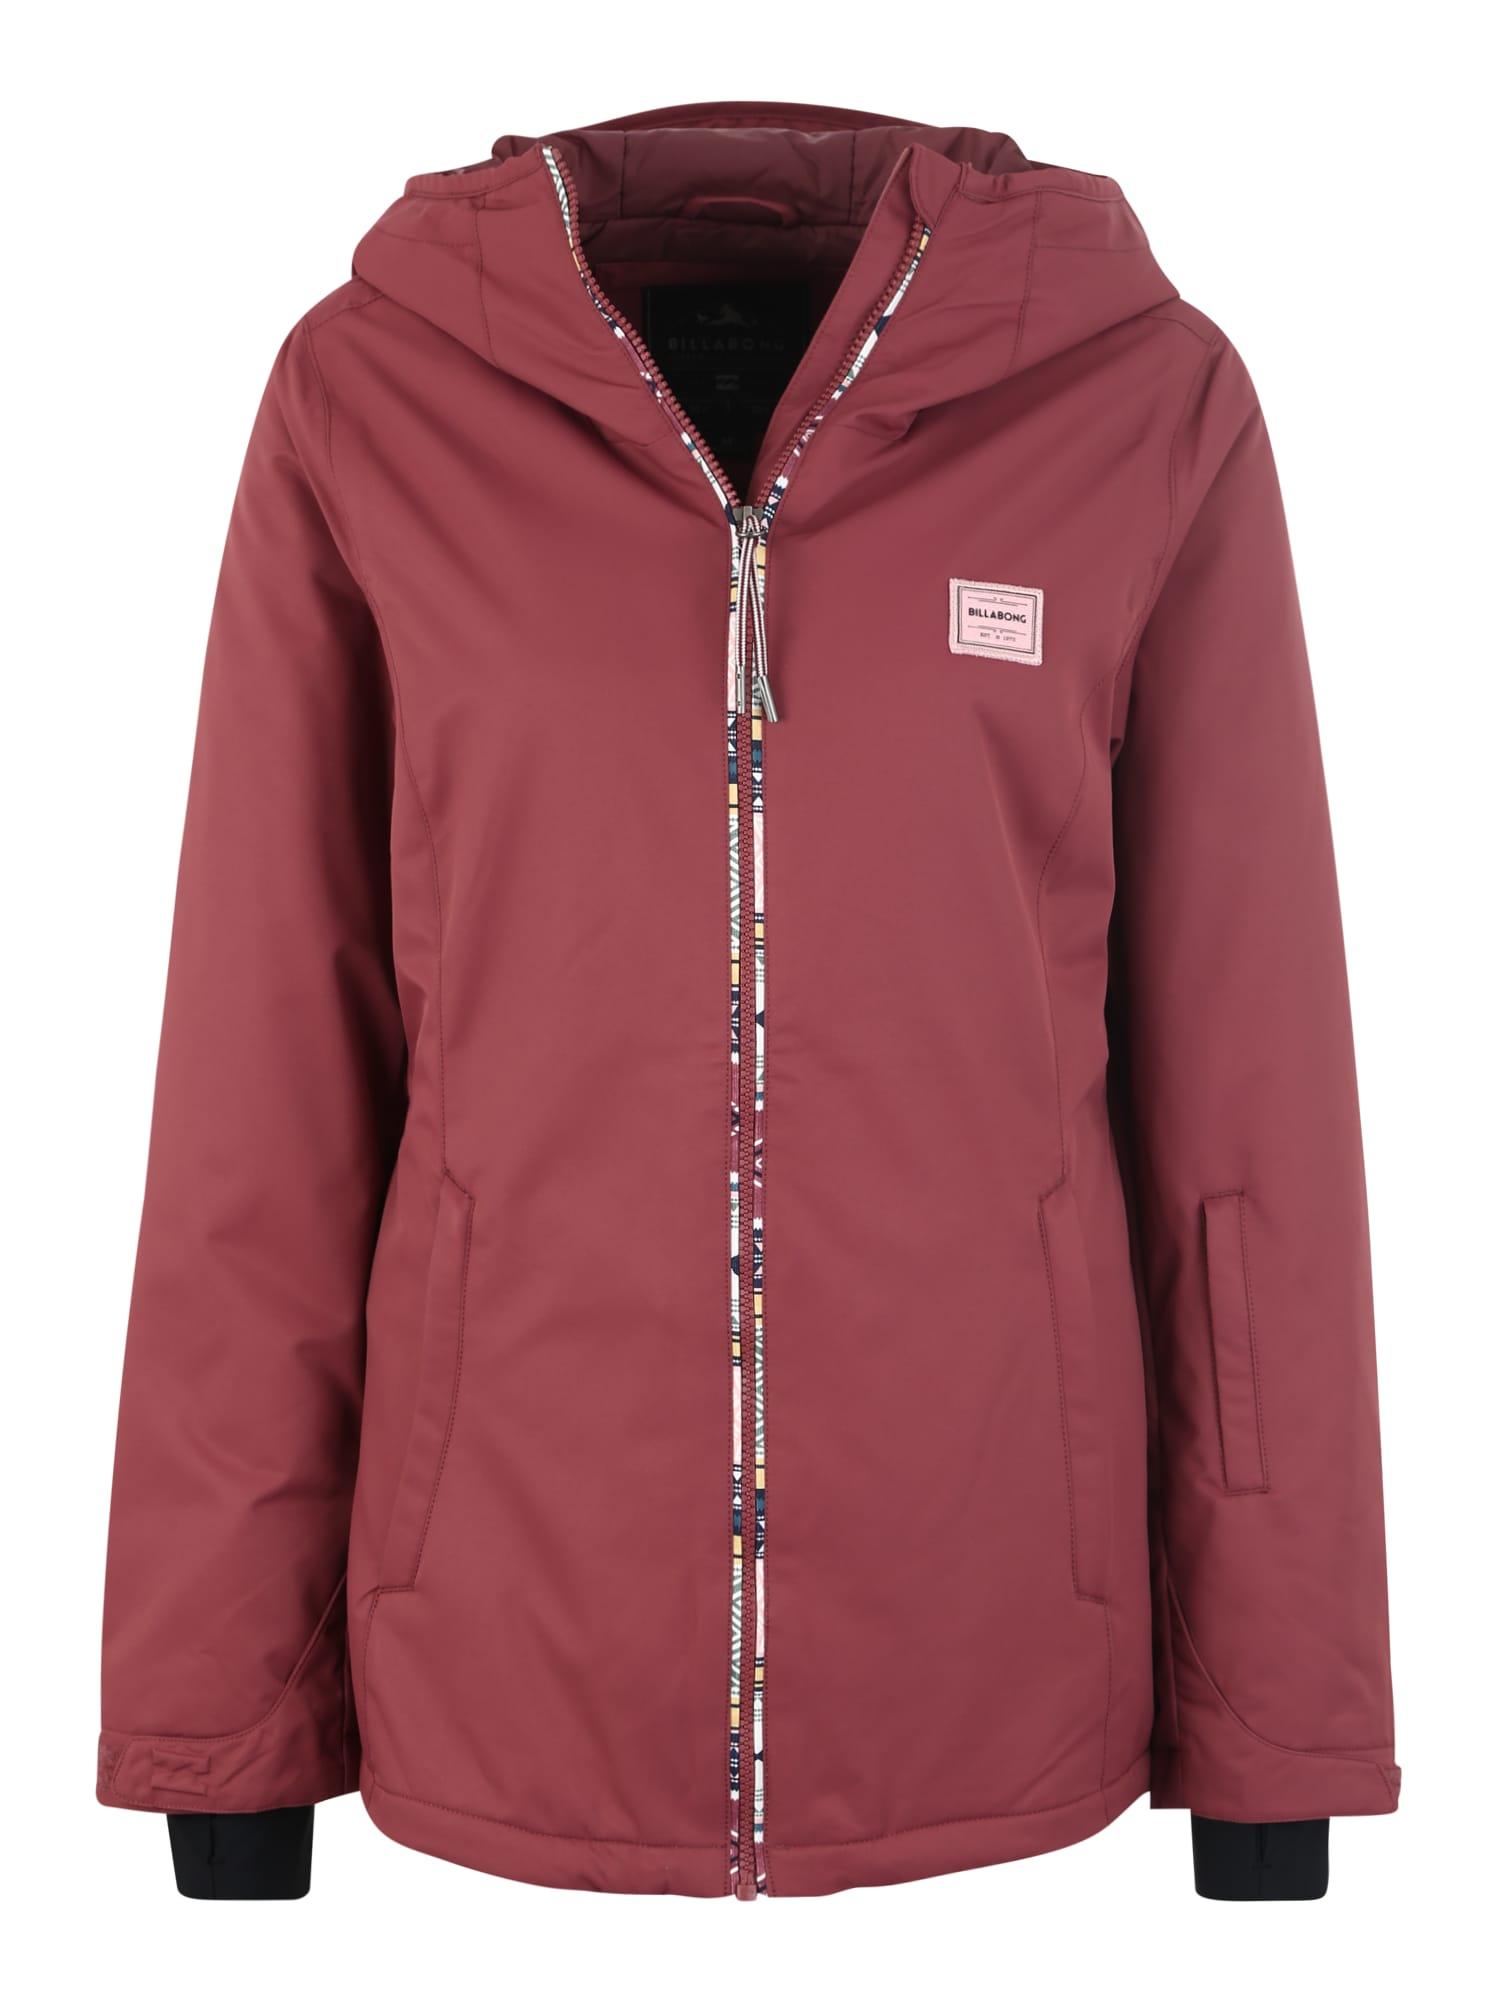 Outdoorová bunda Sula Solid pink BILLABONG